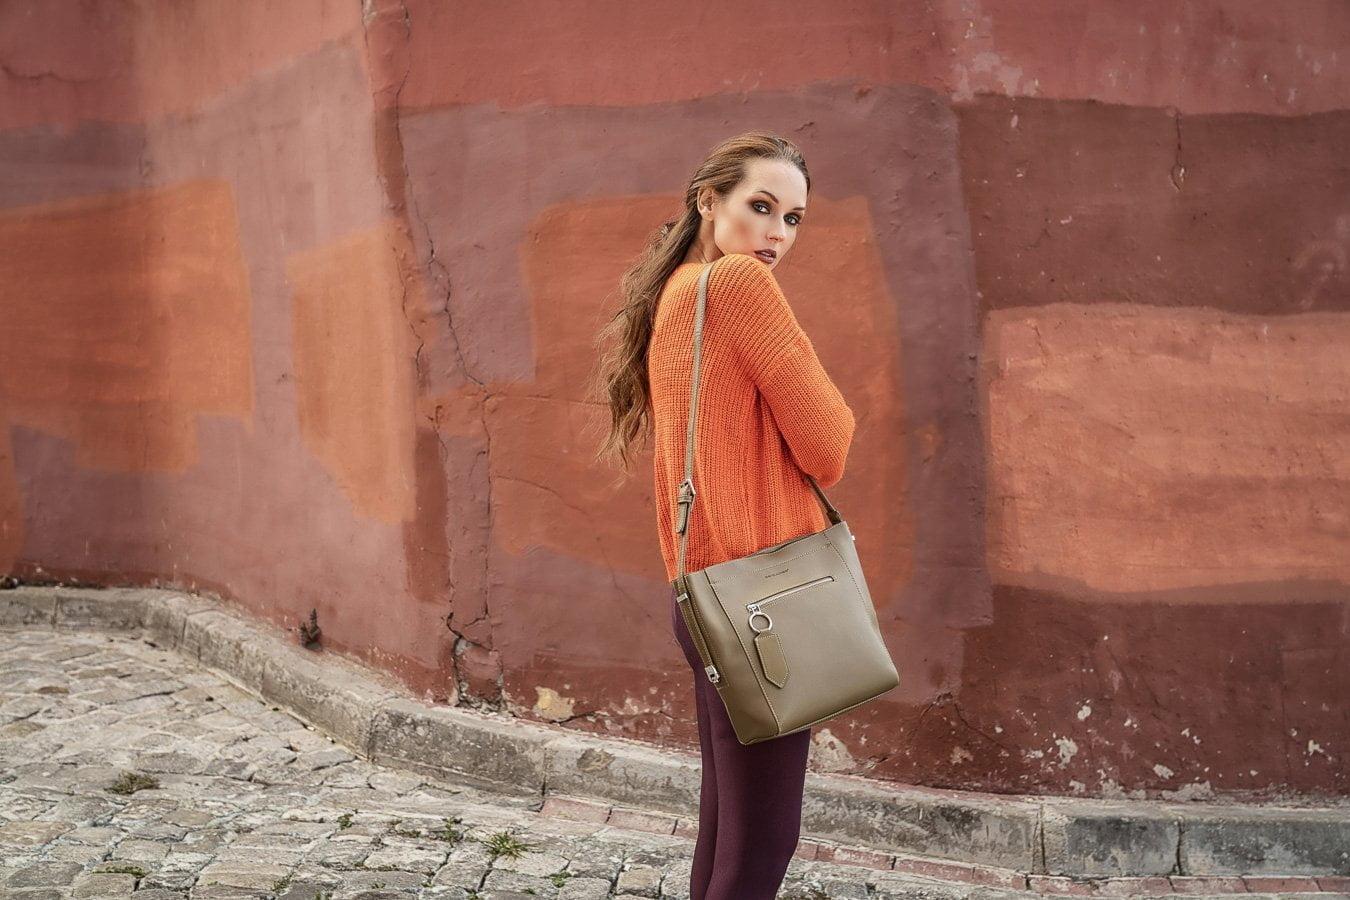 Moda Çekimi - Editorial - Beauty moda tekstil burakbulutfotografatolyesi 22